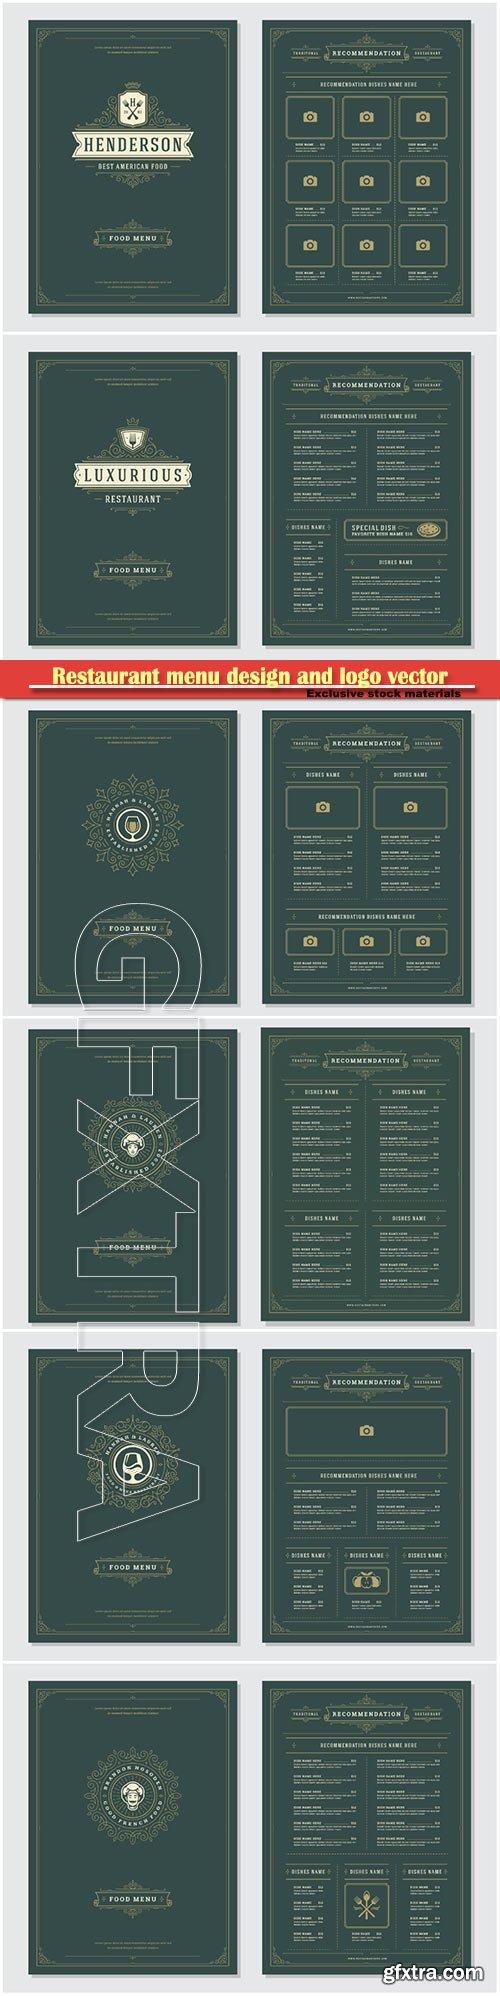 Restaurant menu design and logo vector brochure template